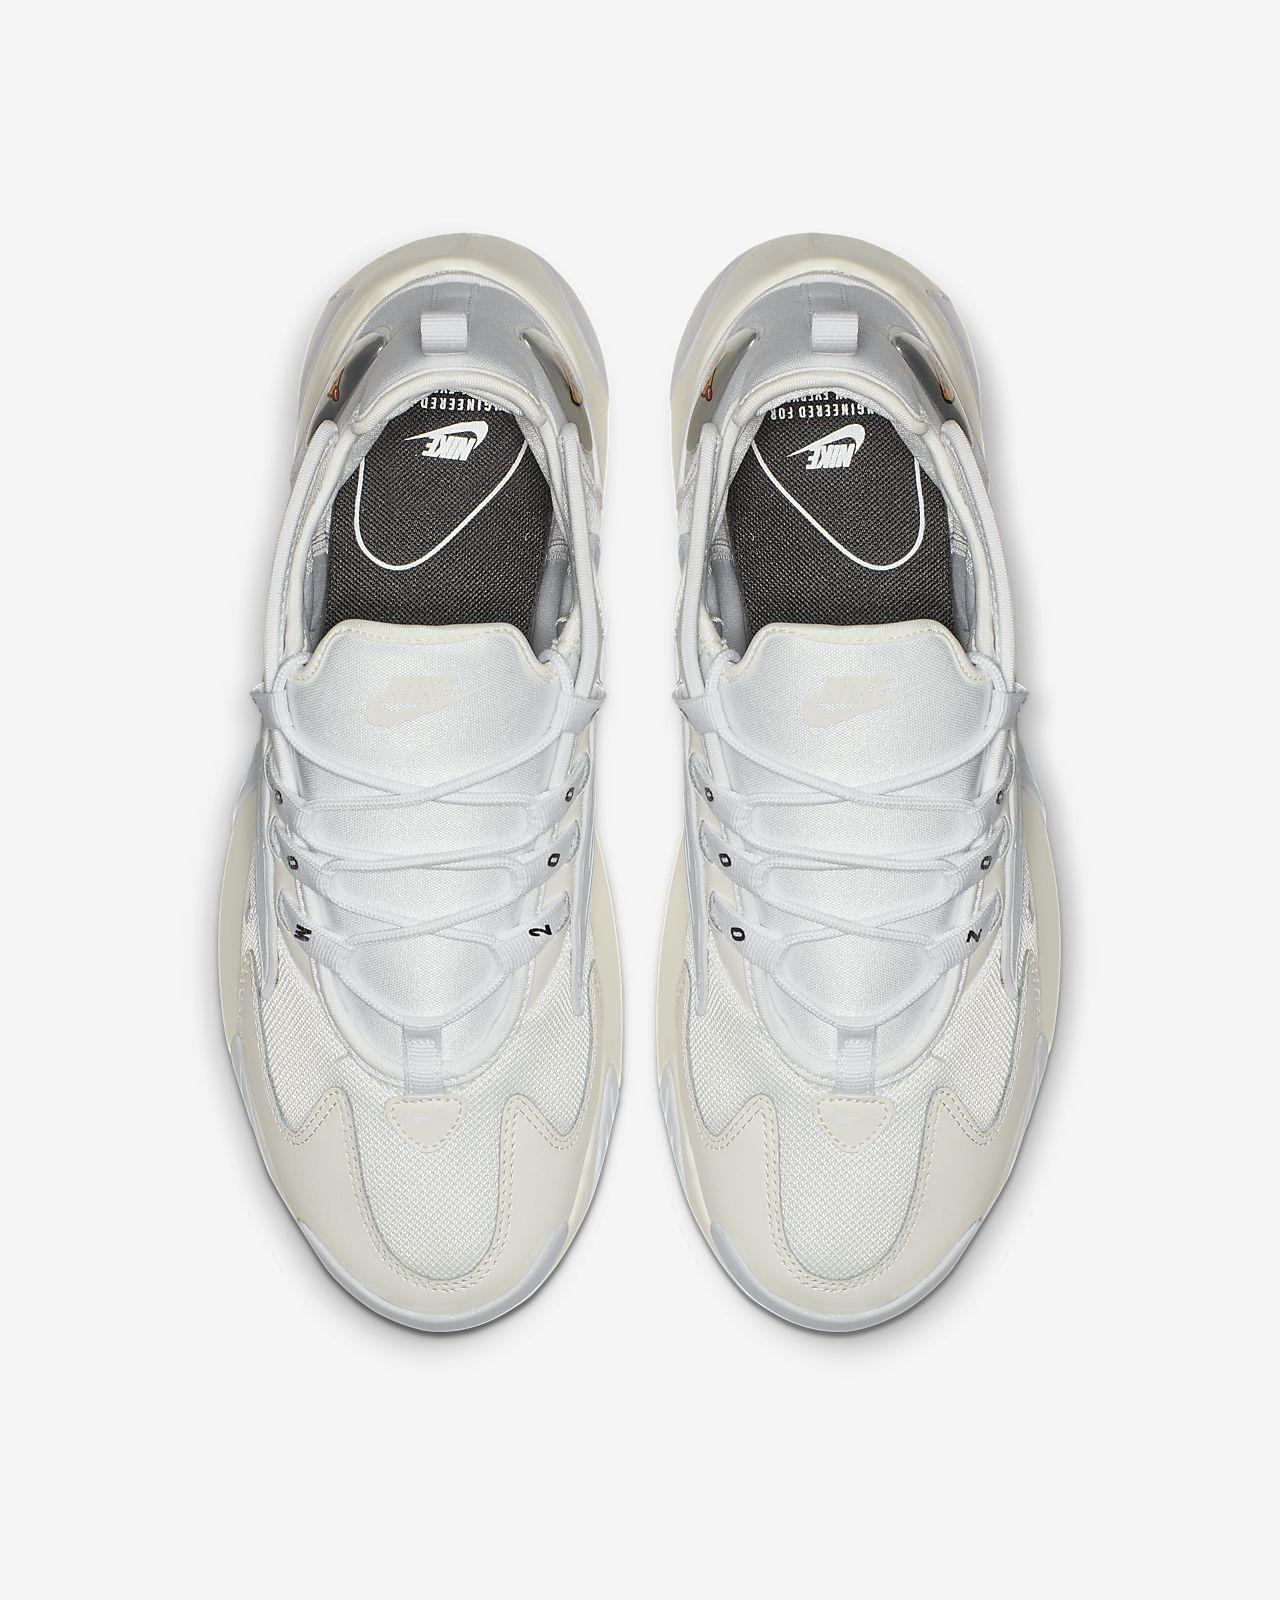 bf013036 Мужские кроссовки Nike Zoom 2K. Nike.com RU